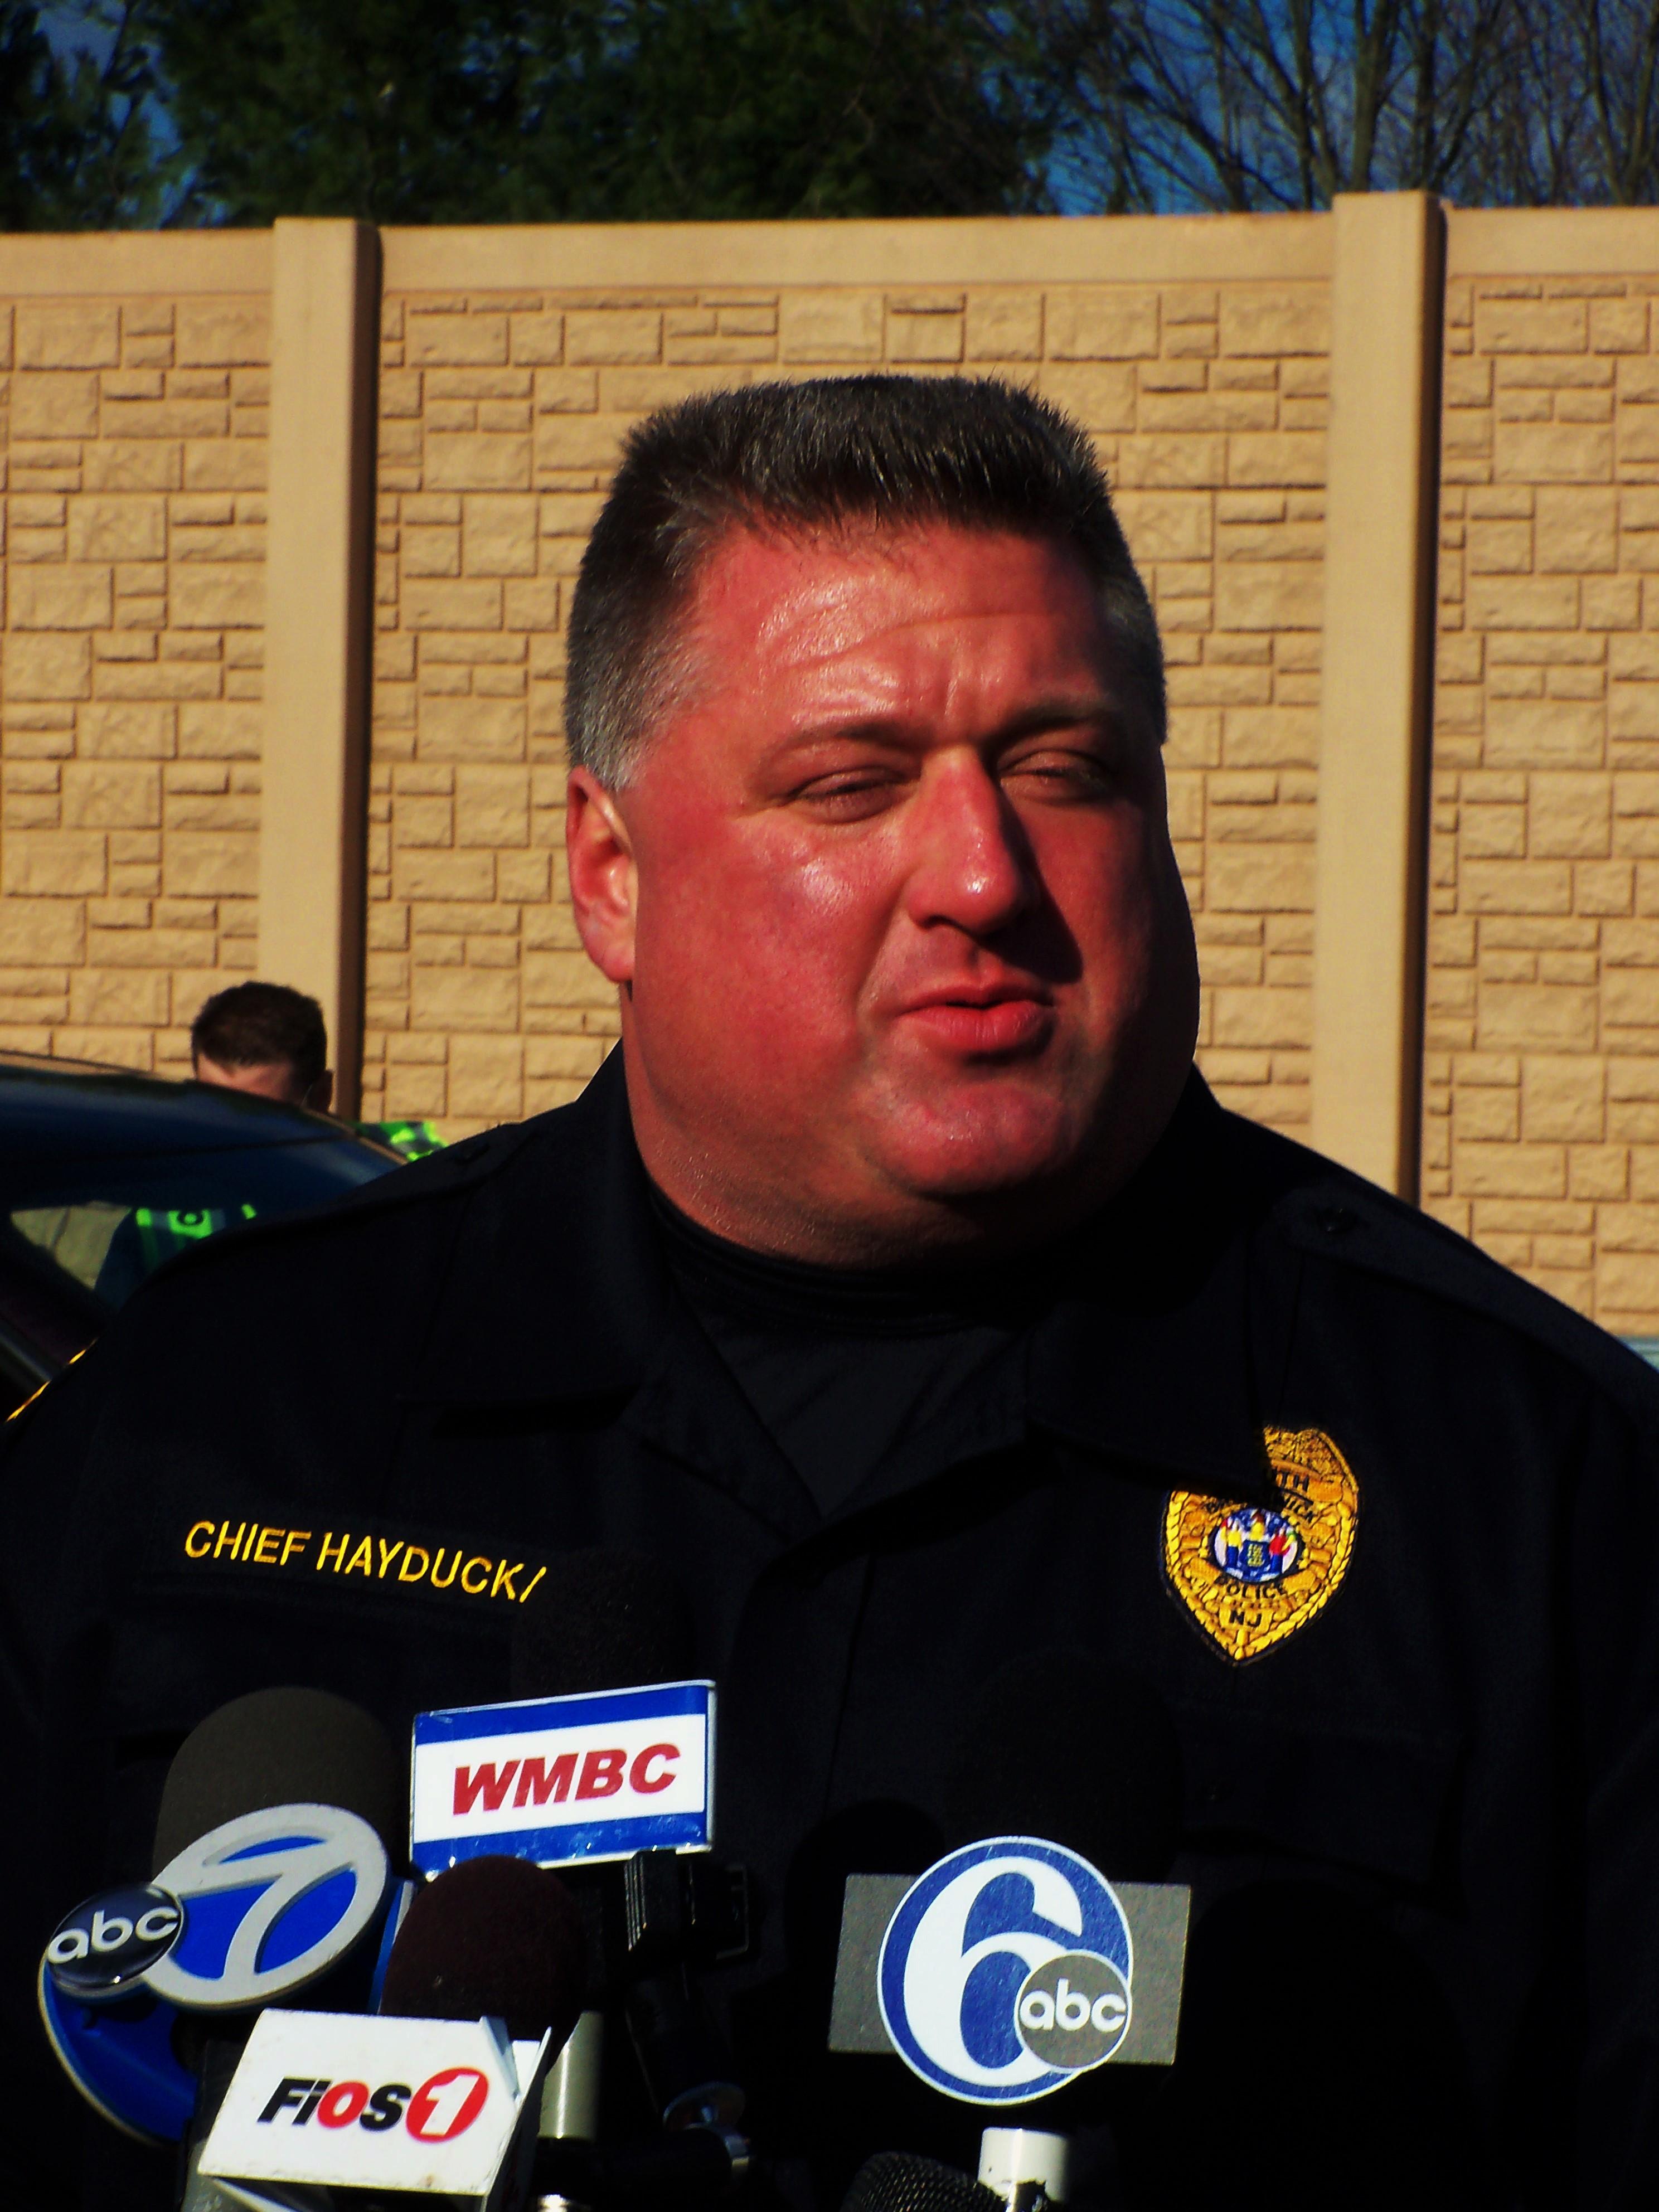 Chief Raymond Hayducka